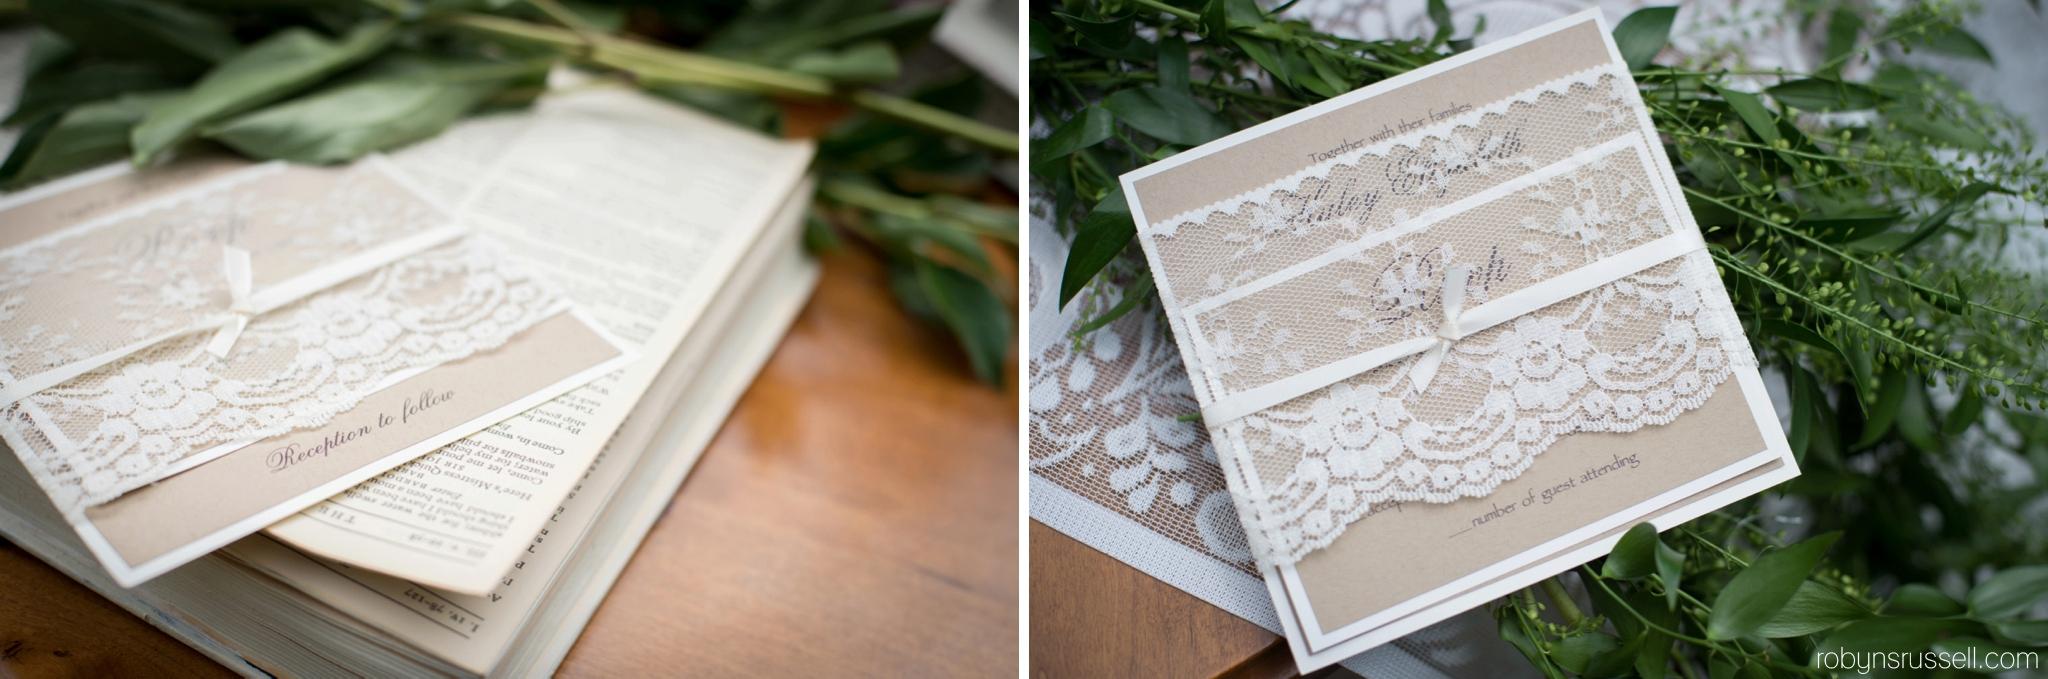 9-wedding-invitations.jpg